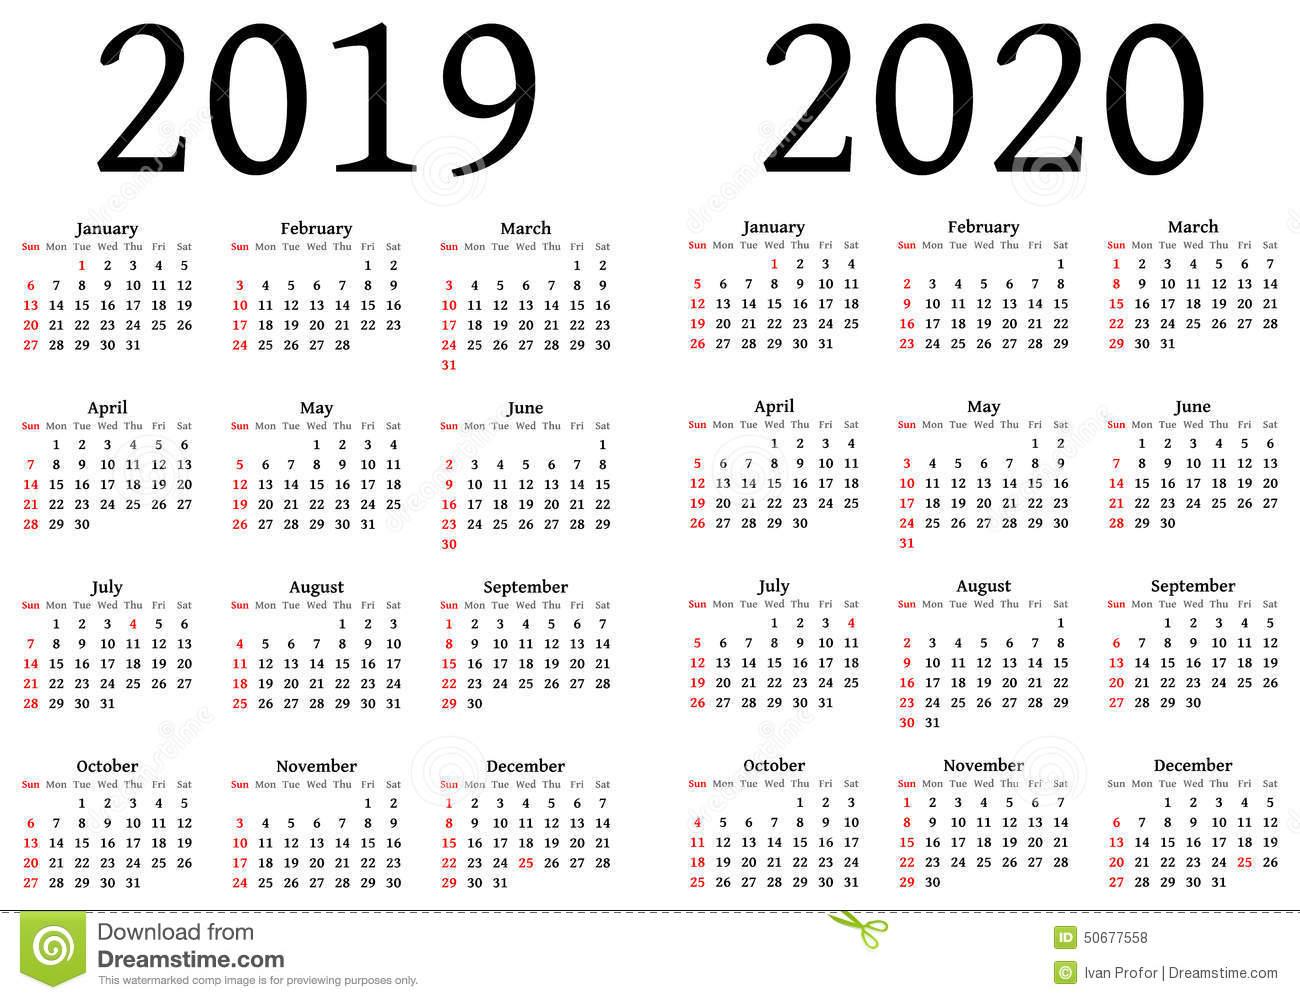 Printable Calendar For 2019 And 2020 | Printable Calendar 2019 with regard to Free Printaabke Calendars For 2019-2020